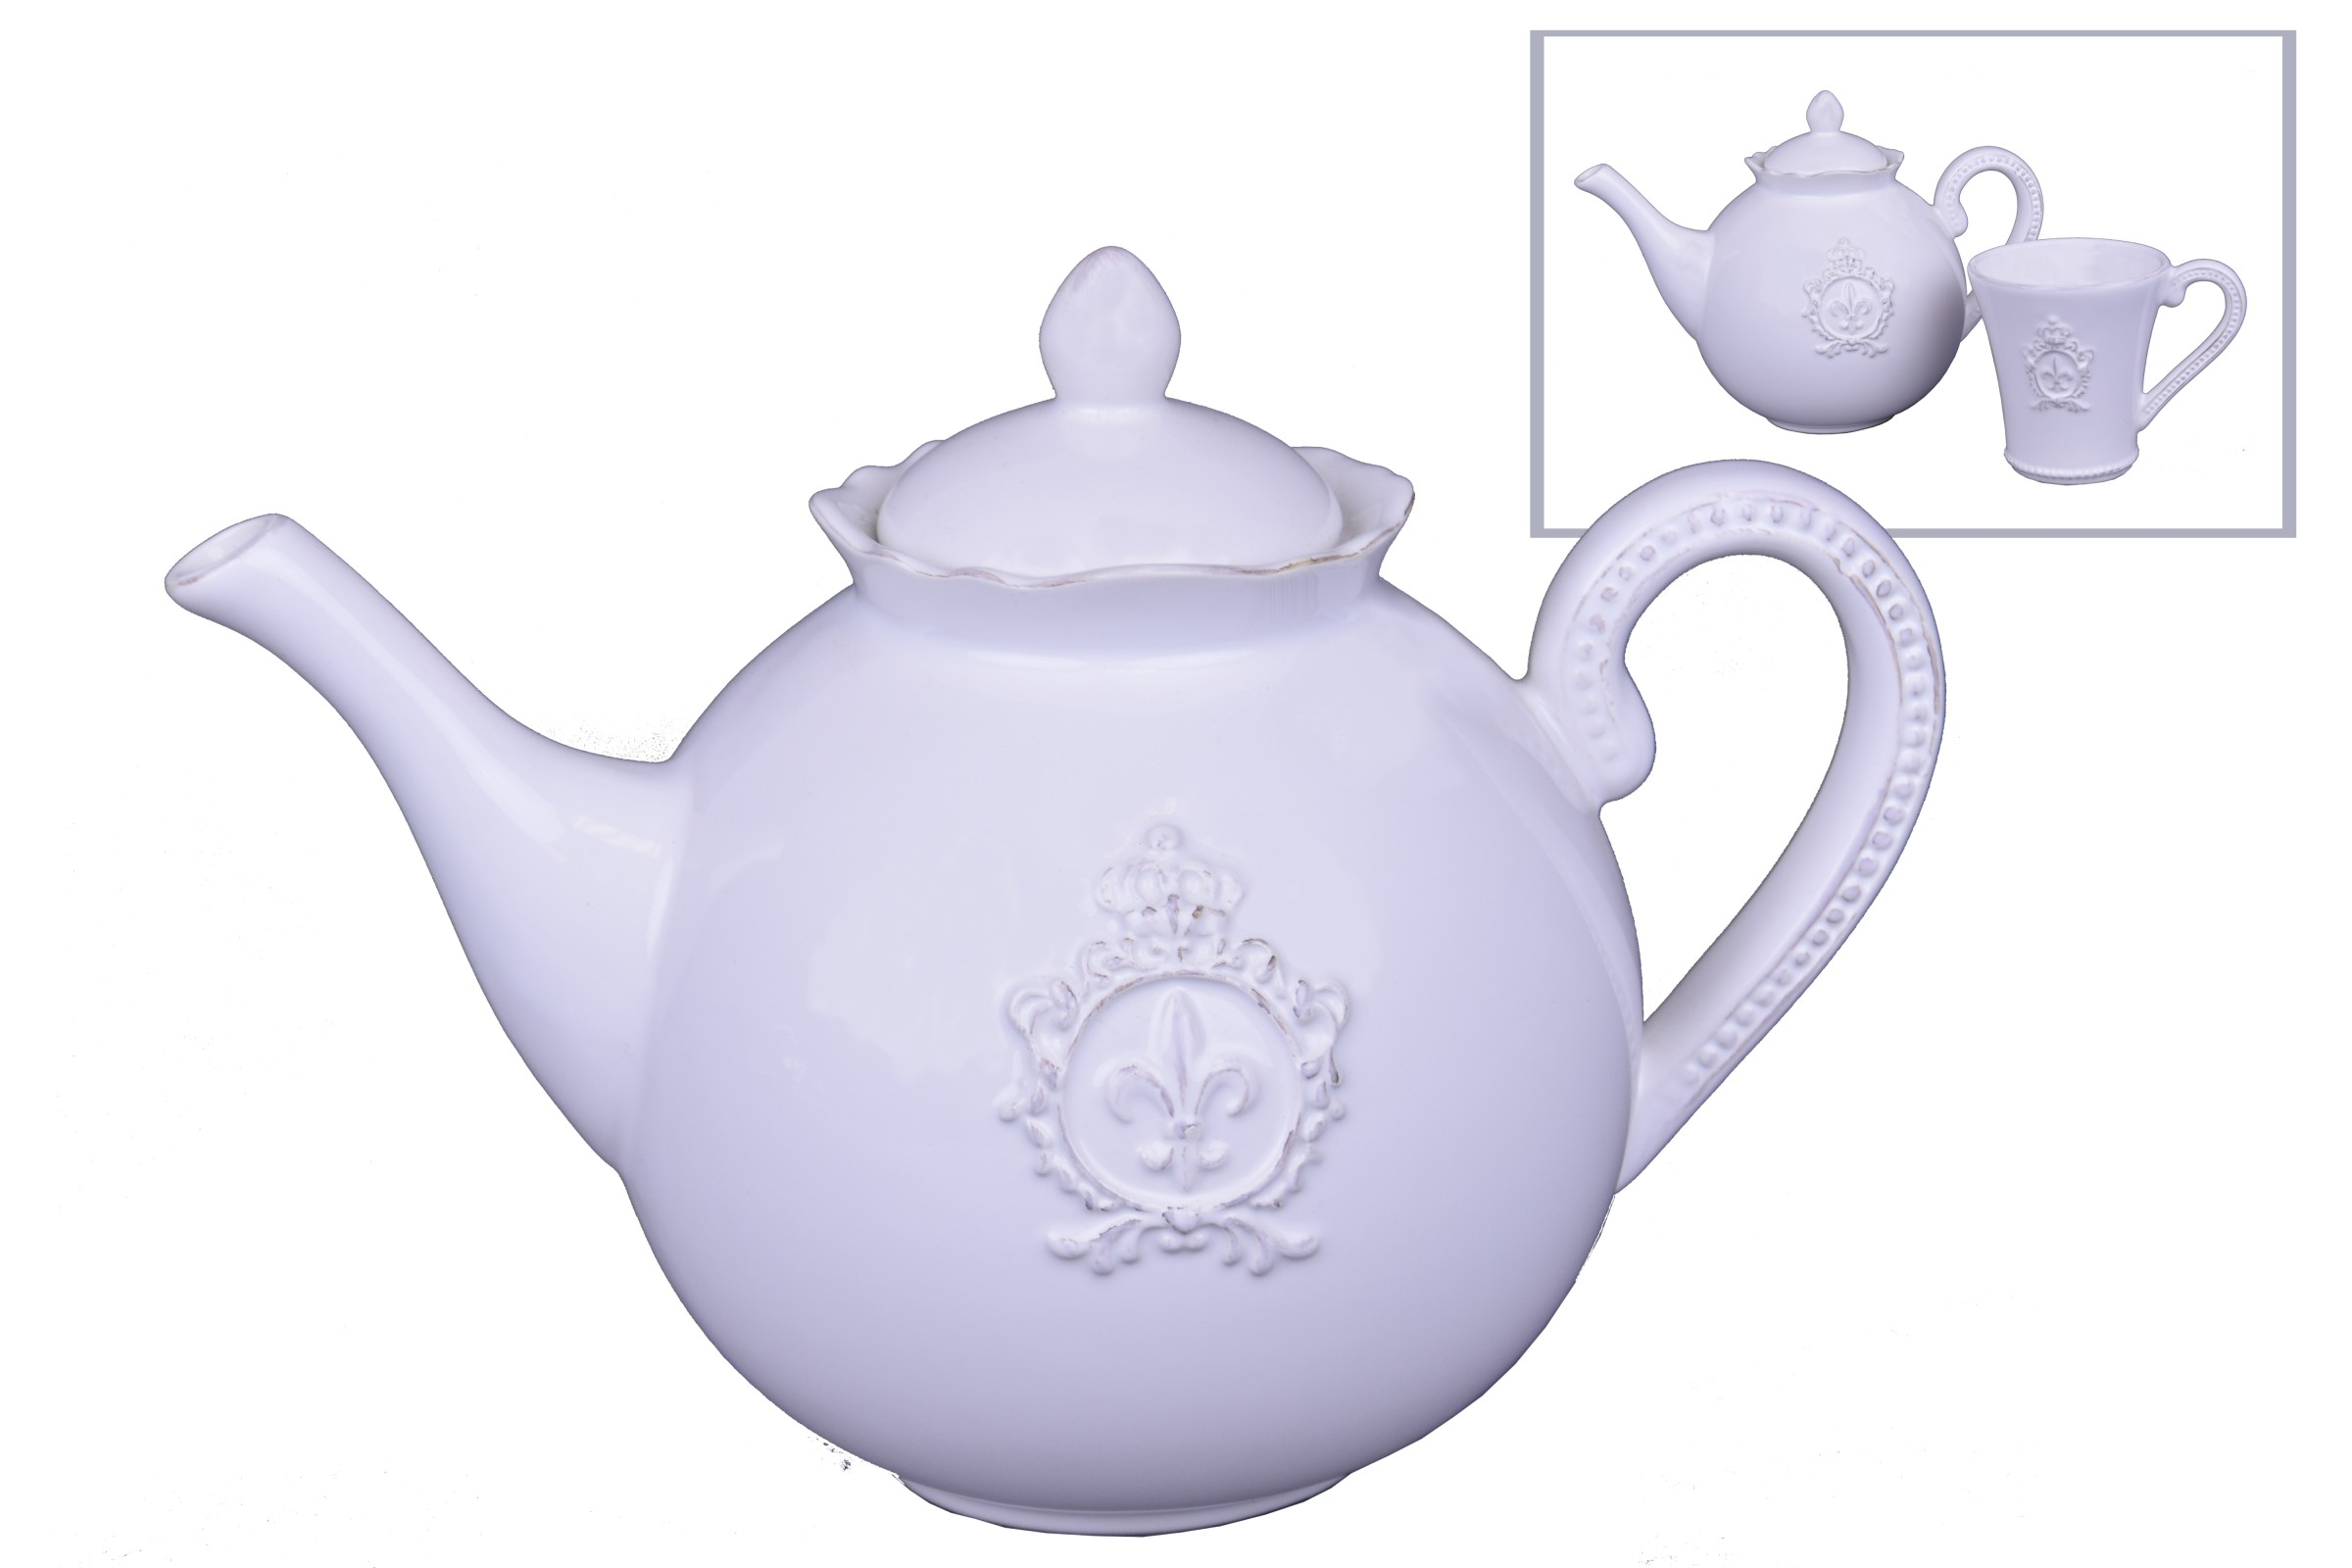 Konvička na čaj se znakem a korunkou 24x17x14cm